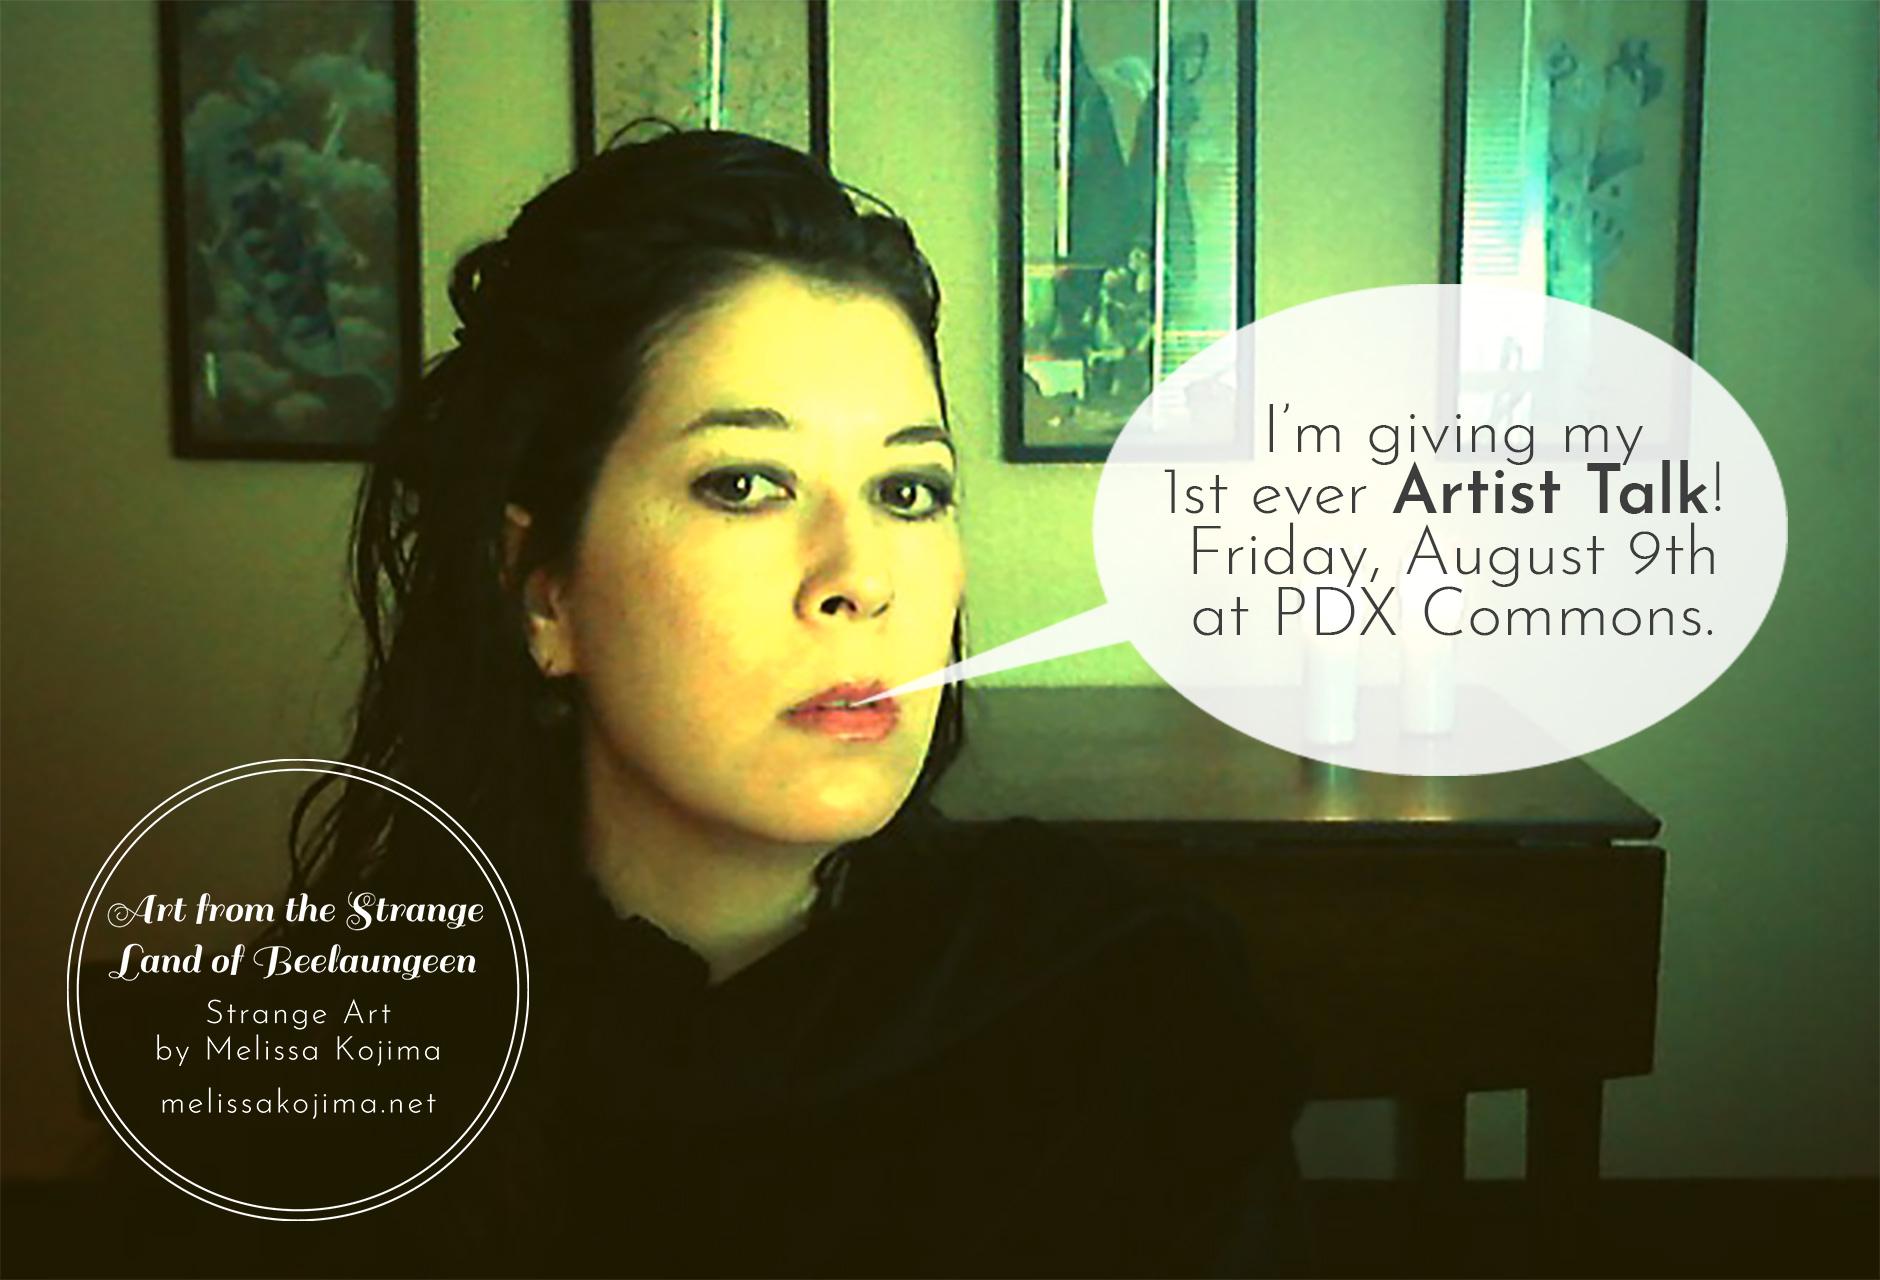 Artist-Talk--Melissa-Kojima-Photo-PDX-Commons.jpg